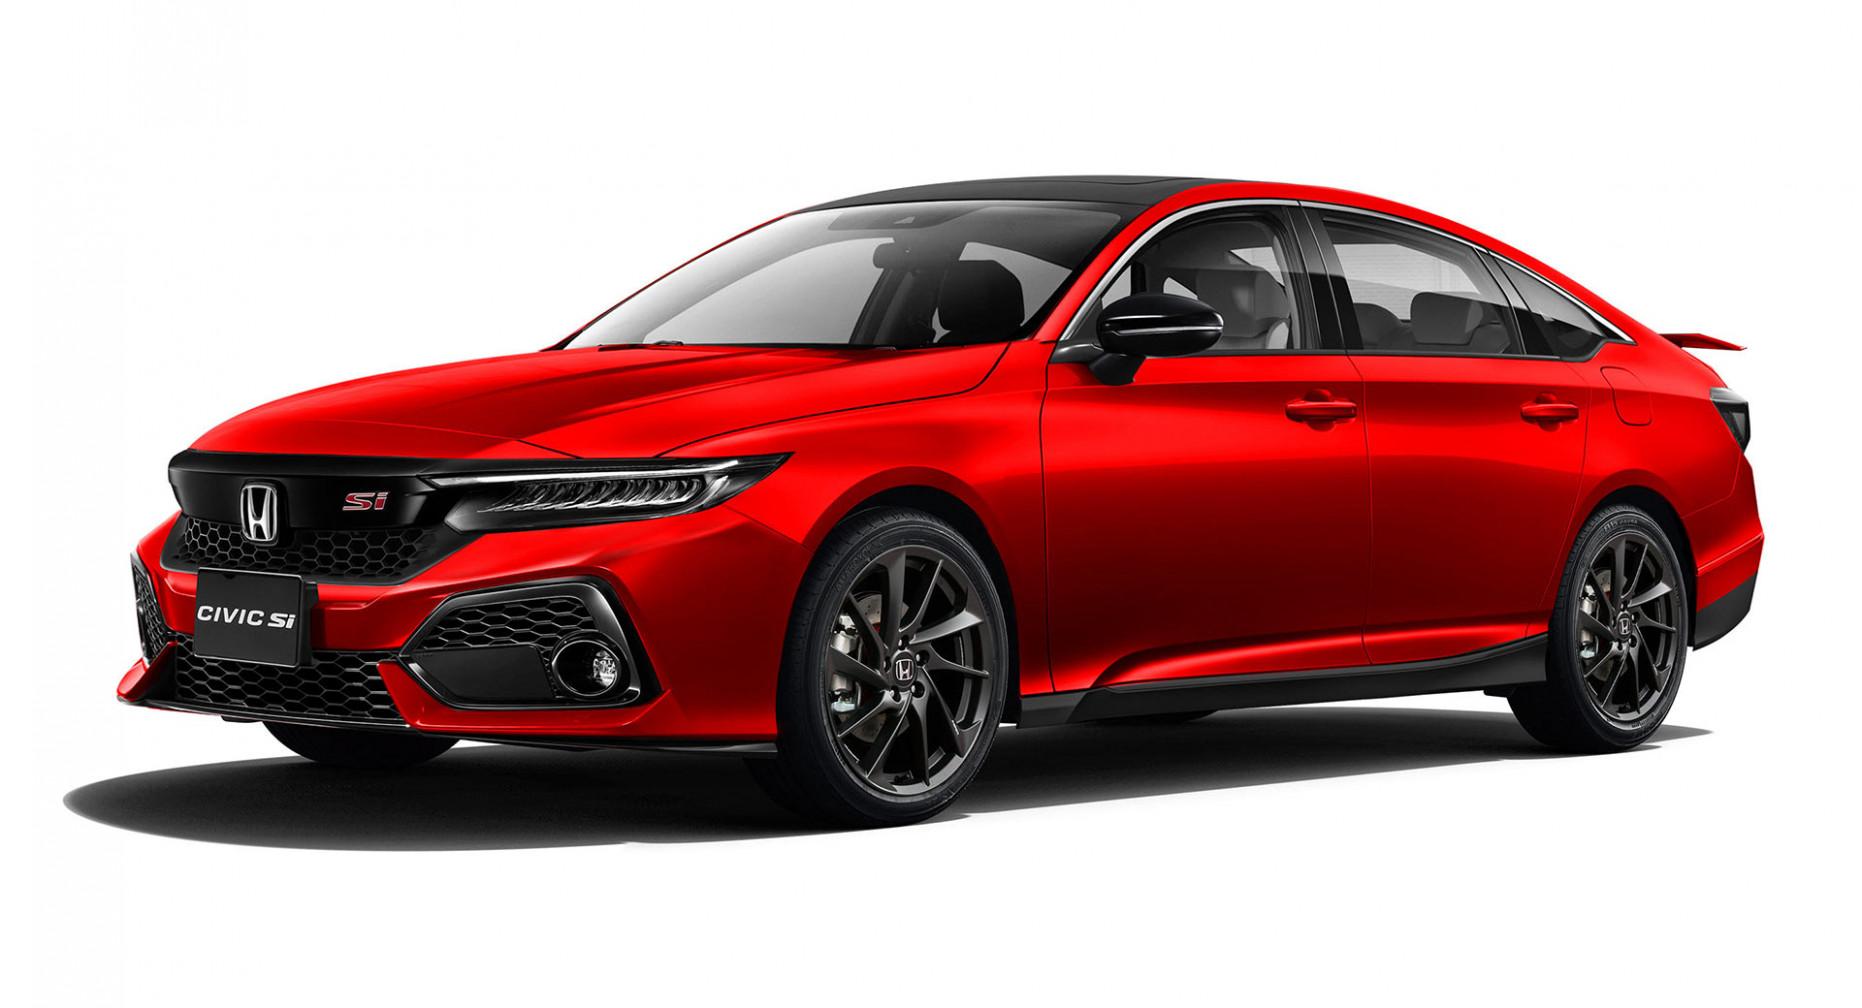 Spesification 2022 Honda Civic